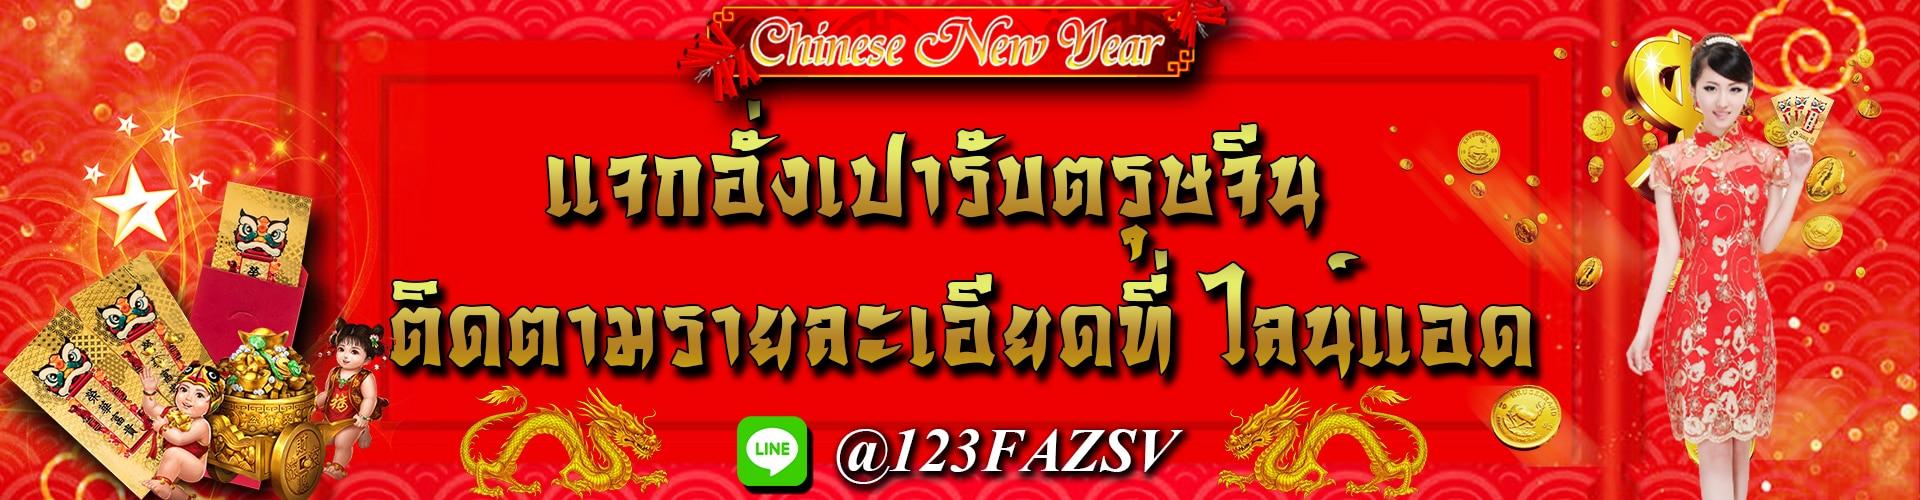 SL -China